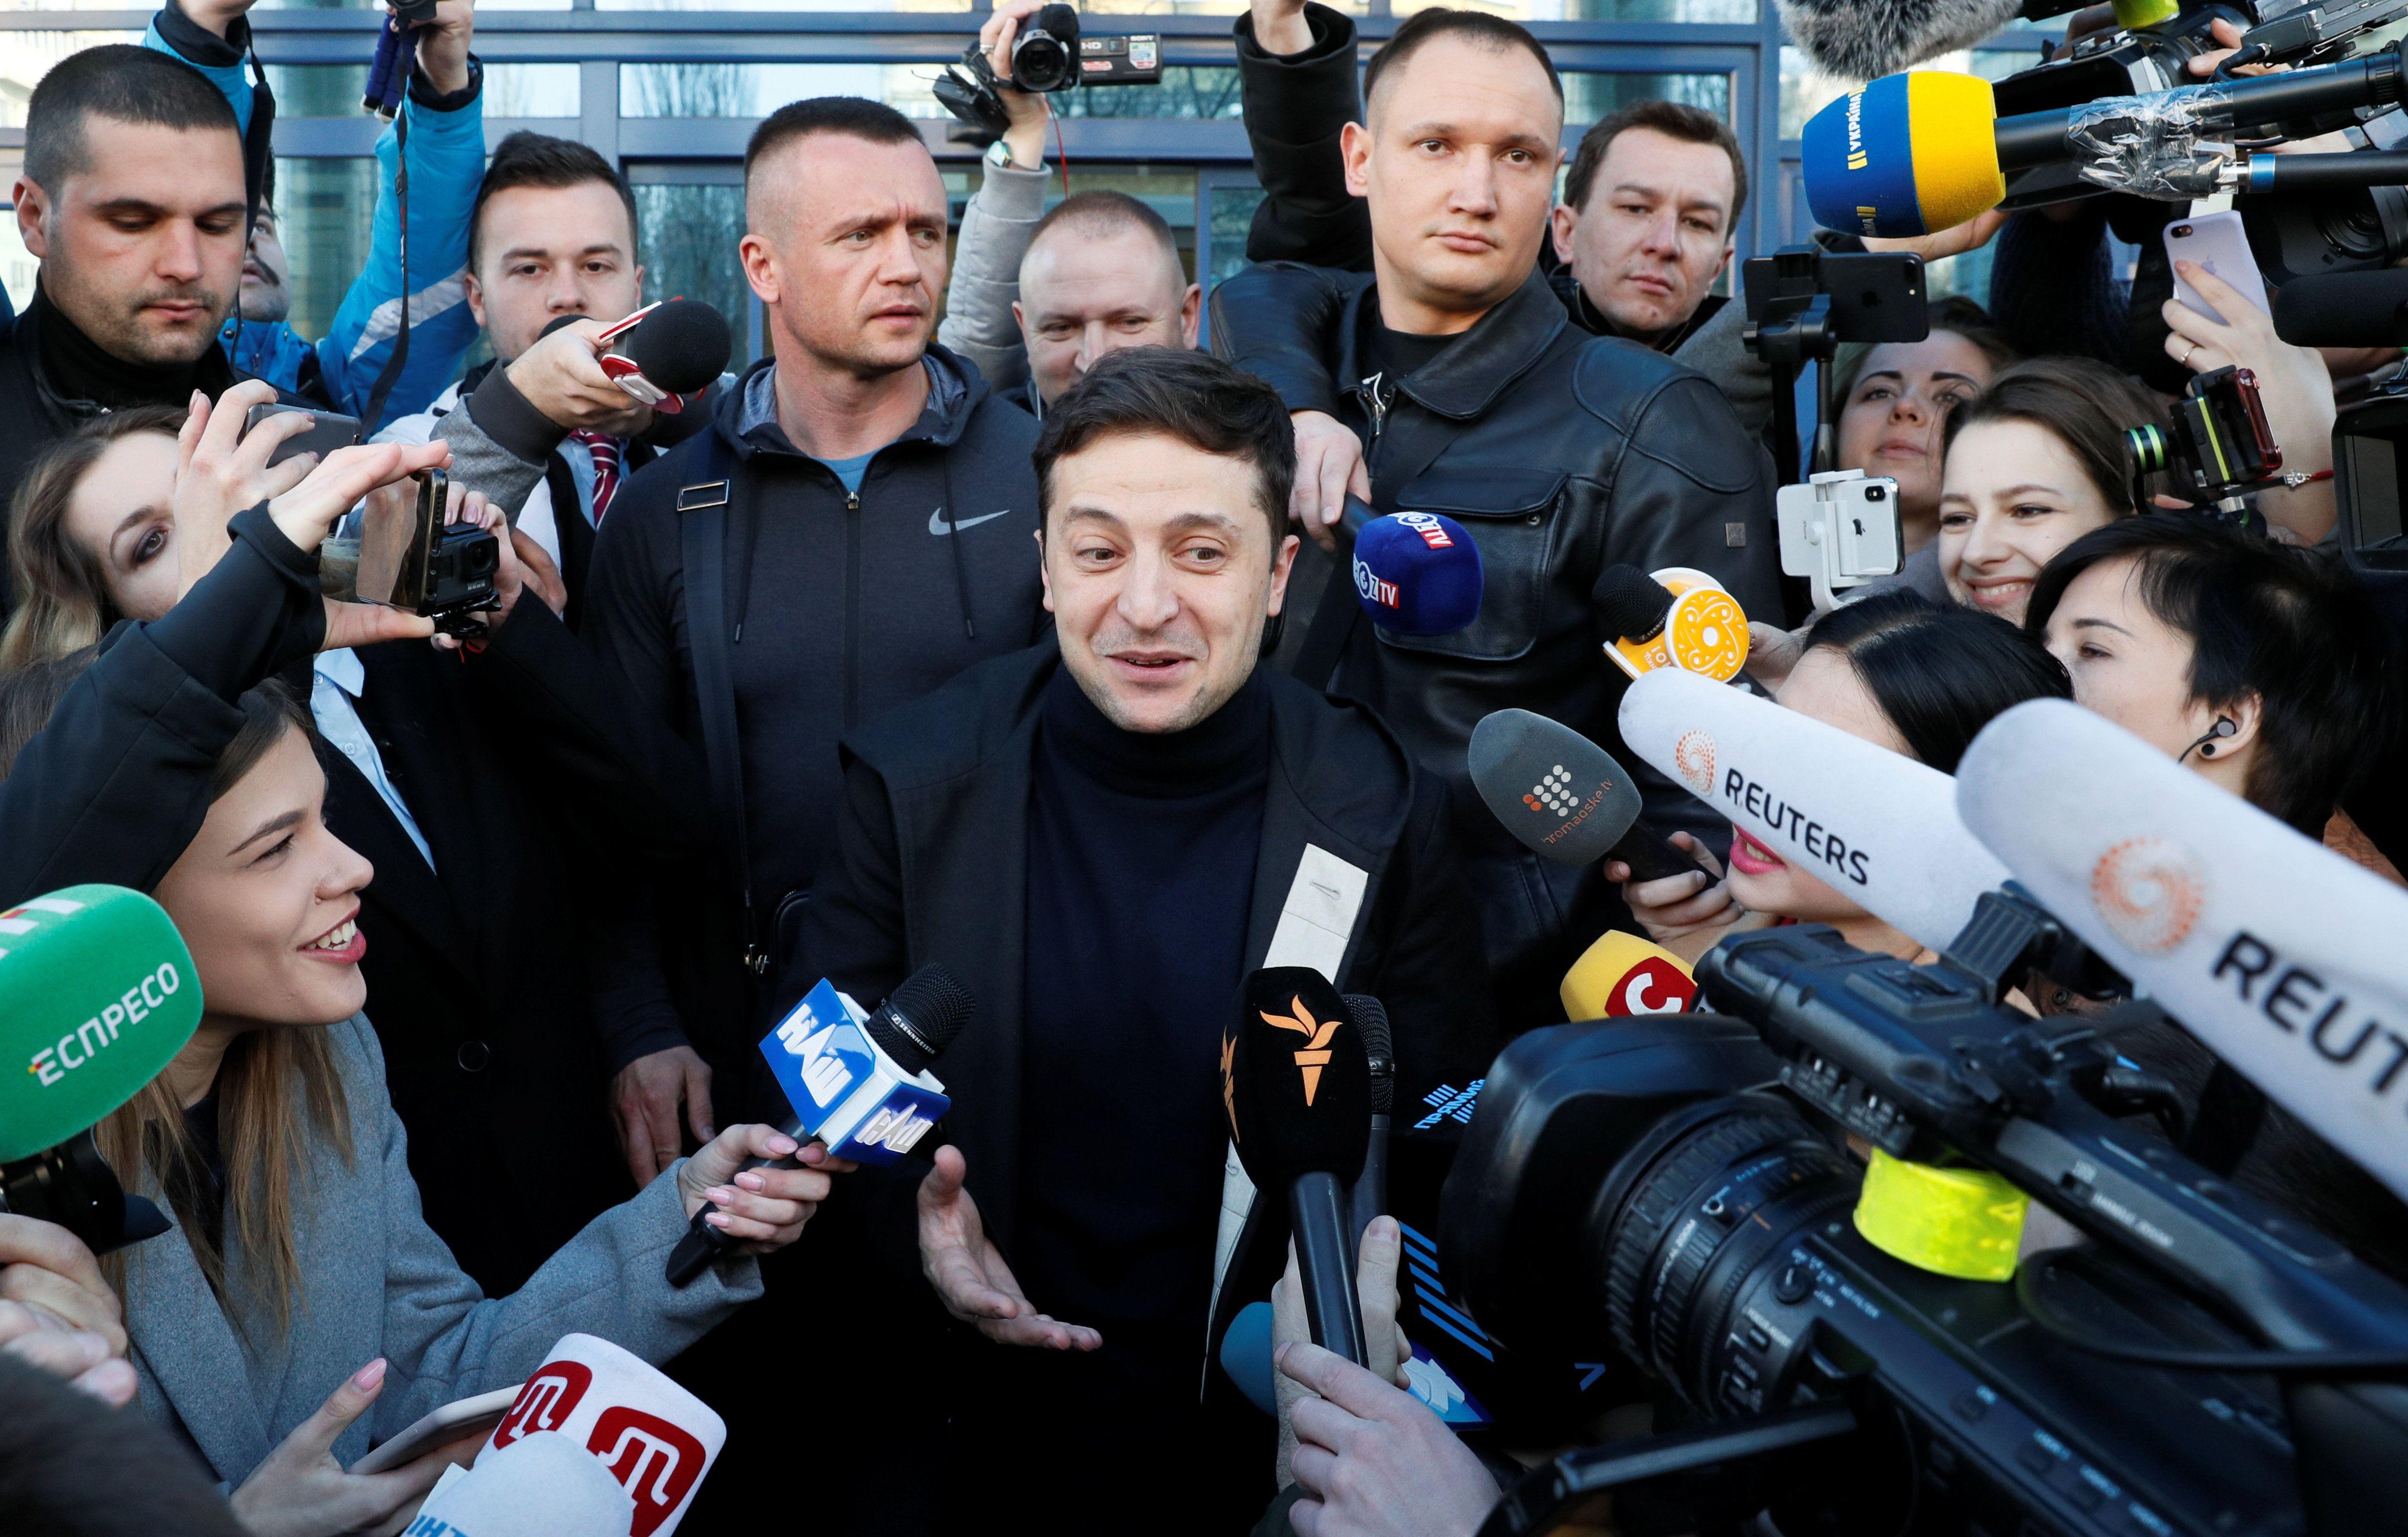 Ukraine: Who Will Serve the Servant?